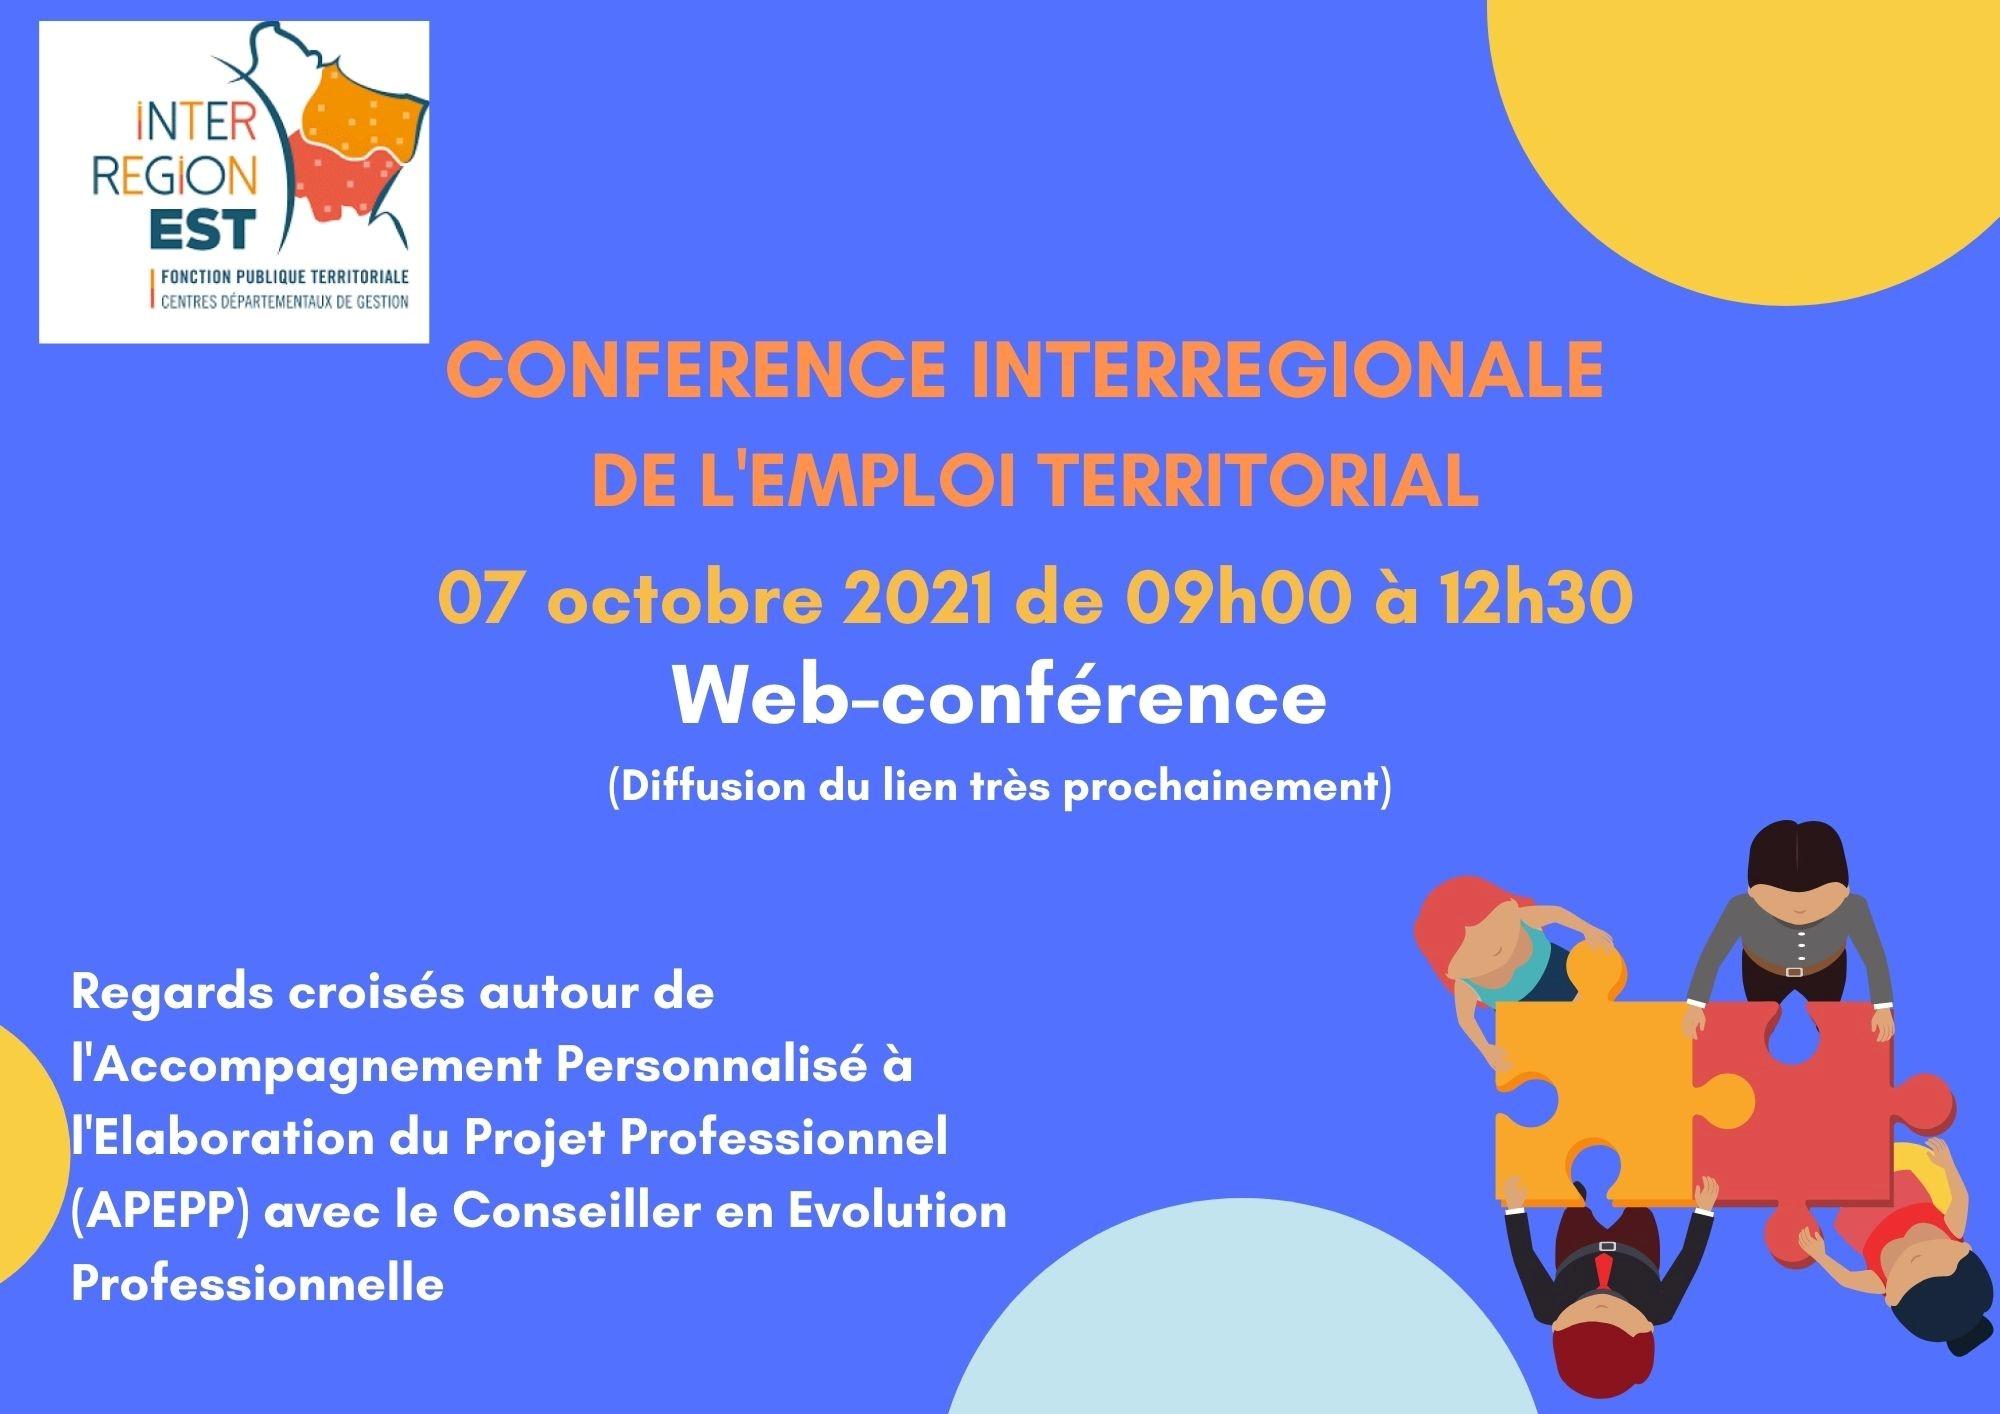 Conférence Interrégionale de l'Emploi Territorial